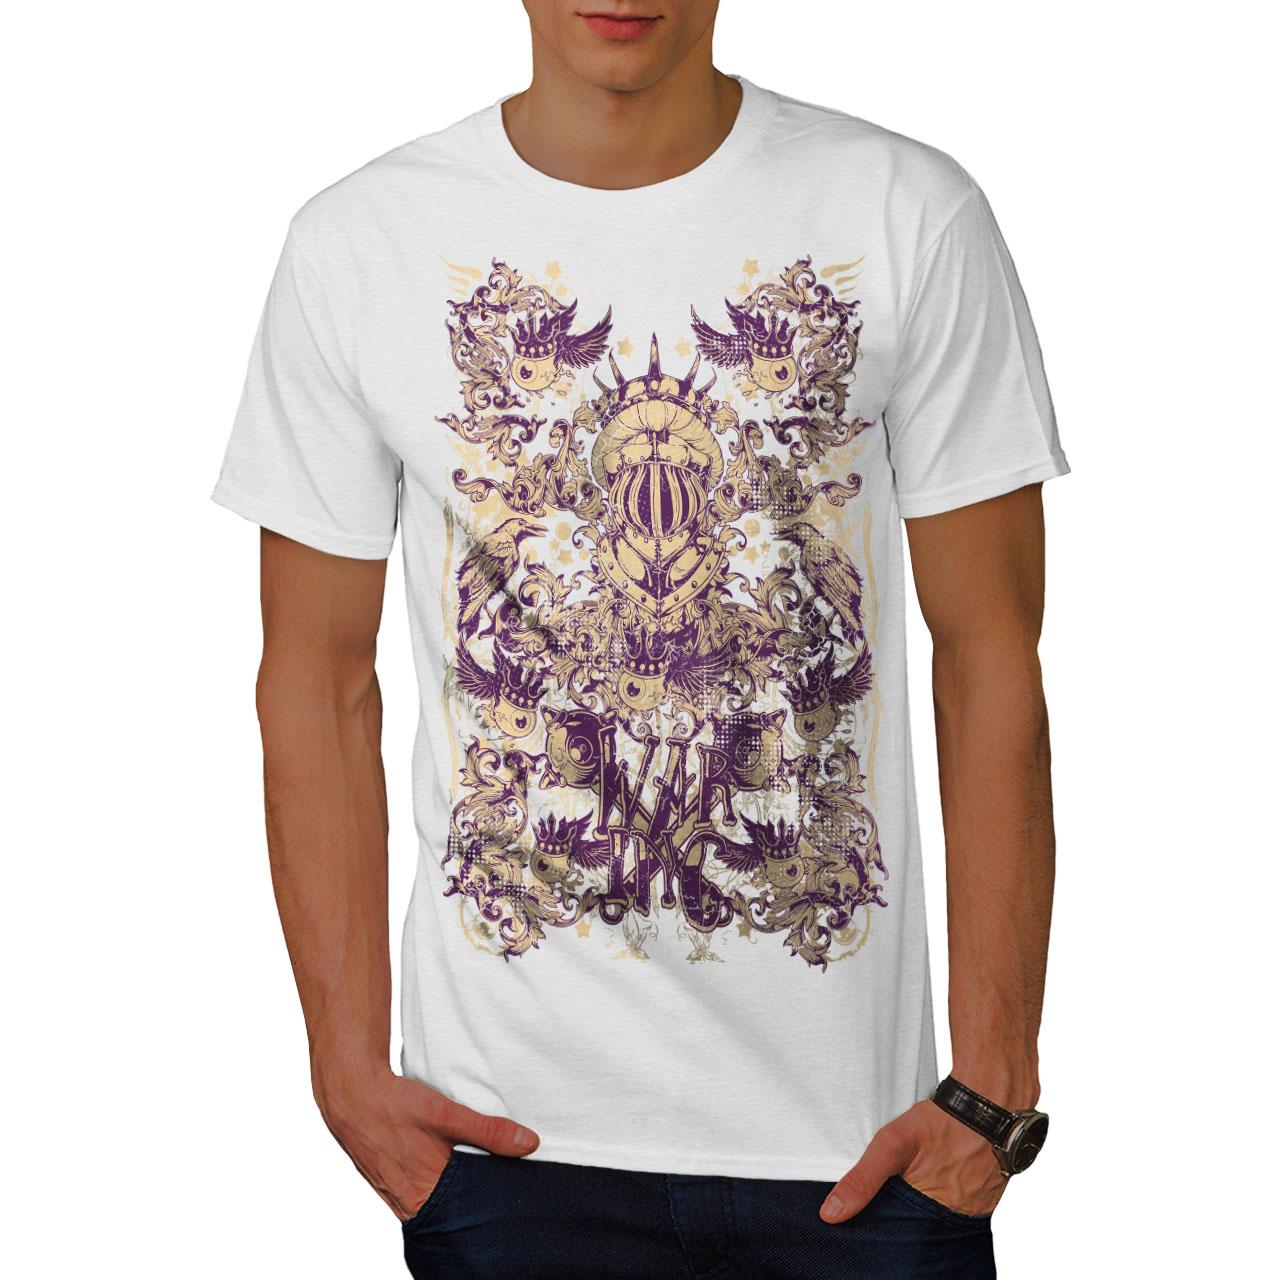 Wellcoda-War-Inc-Zombie-Mens-T-shirt-Monster-Graphic-Design-Printed-Tee thumbnail 9